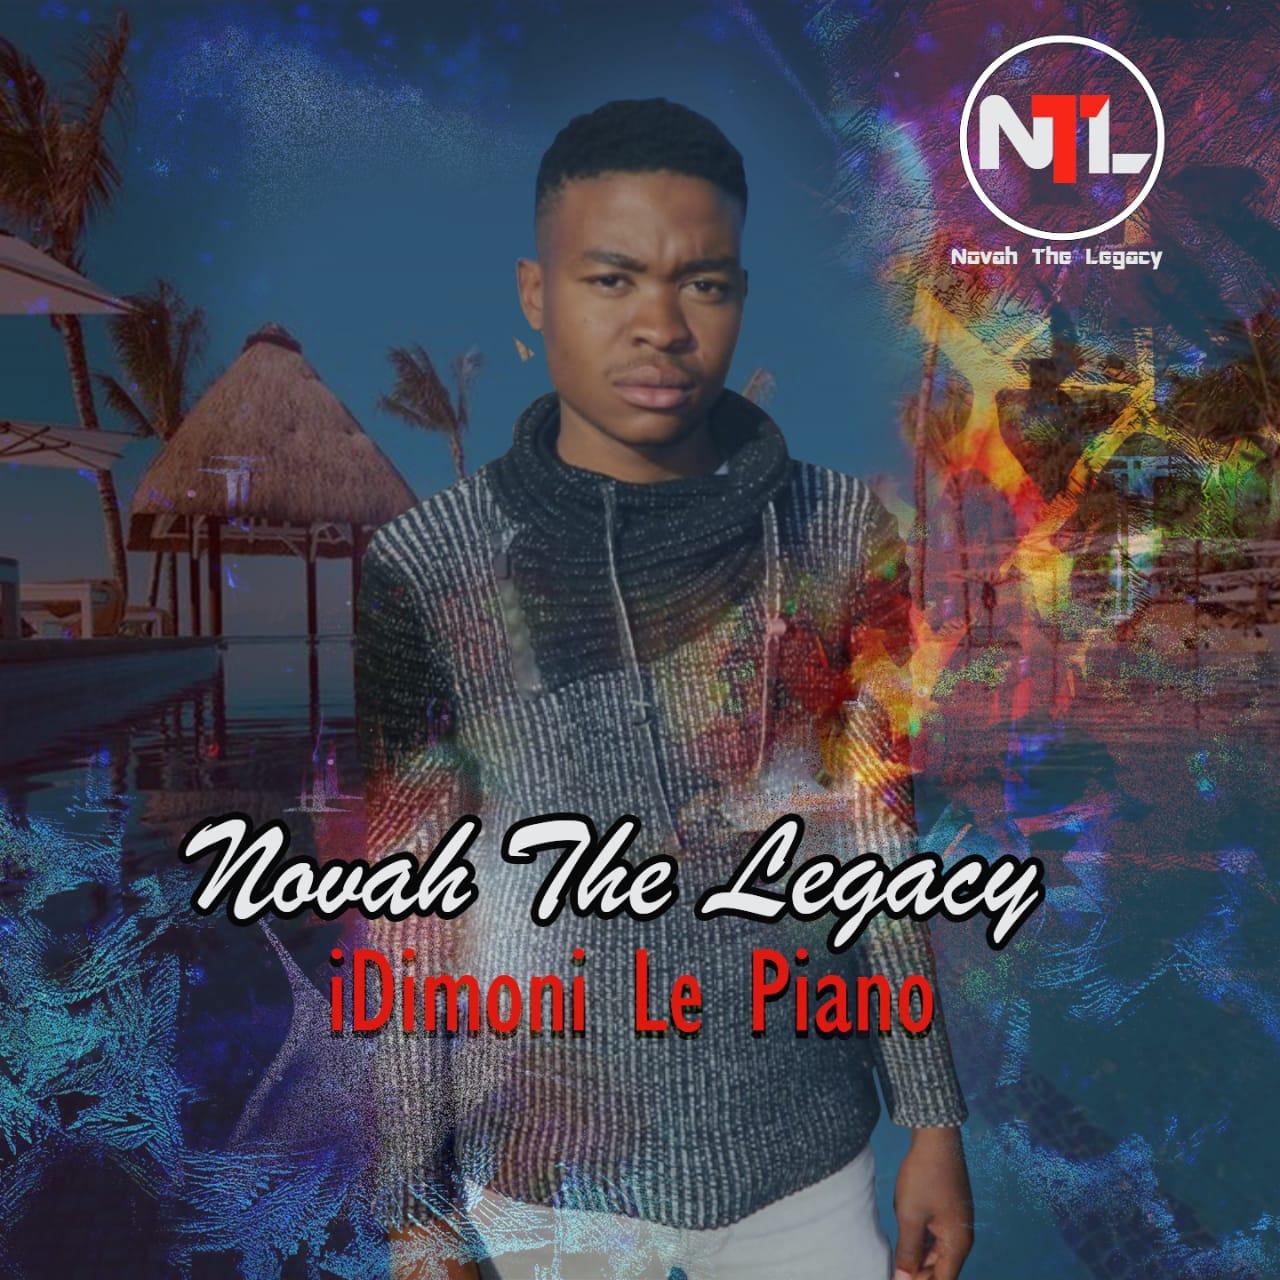 Novah The Legacy